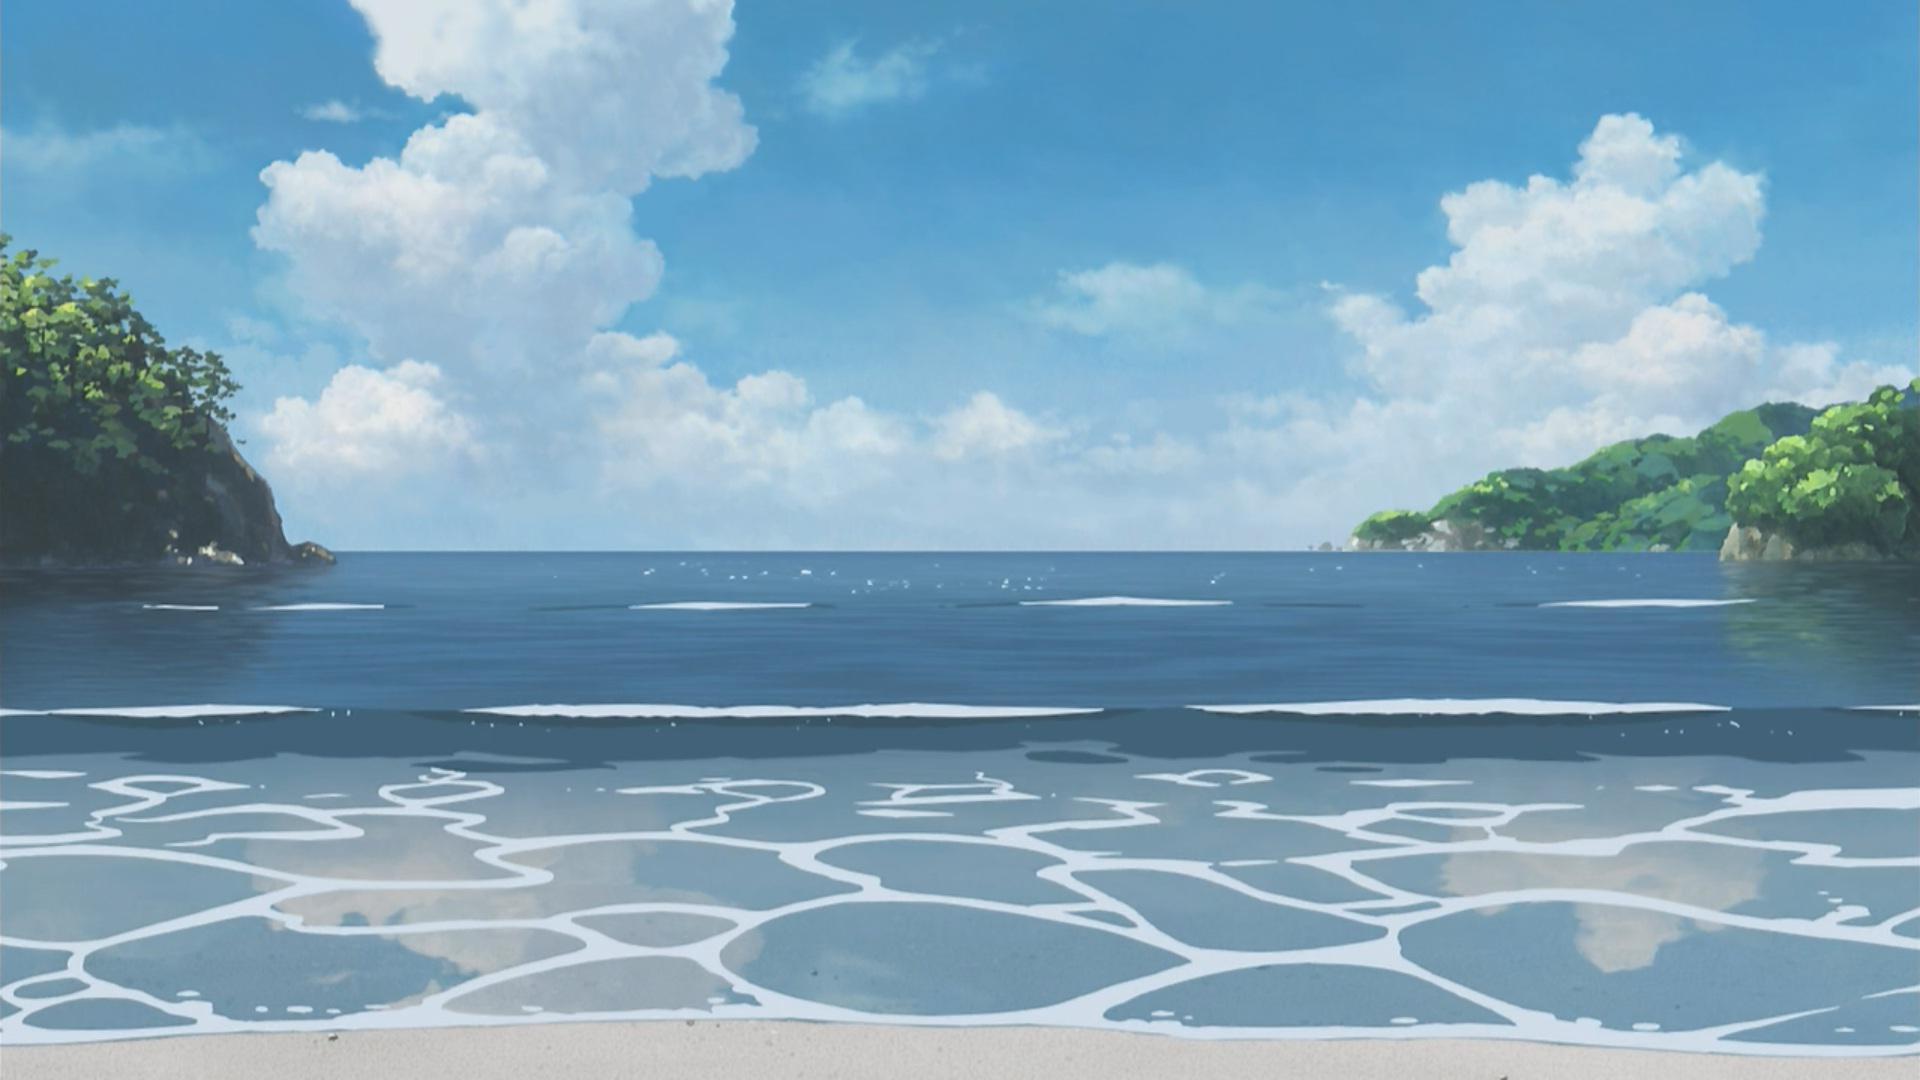 Anime Beach Scenery Wallpaper 6379 1920x1080 - uMad com